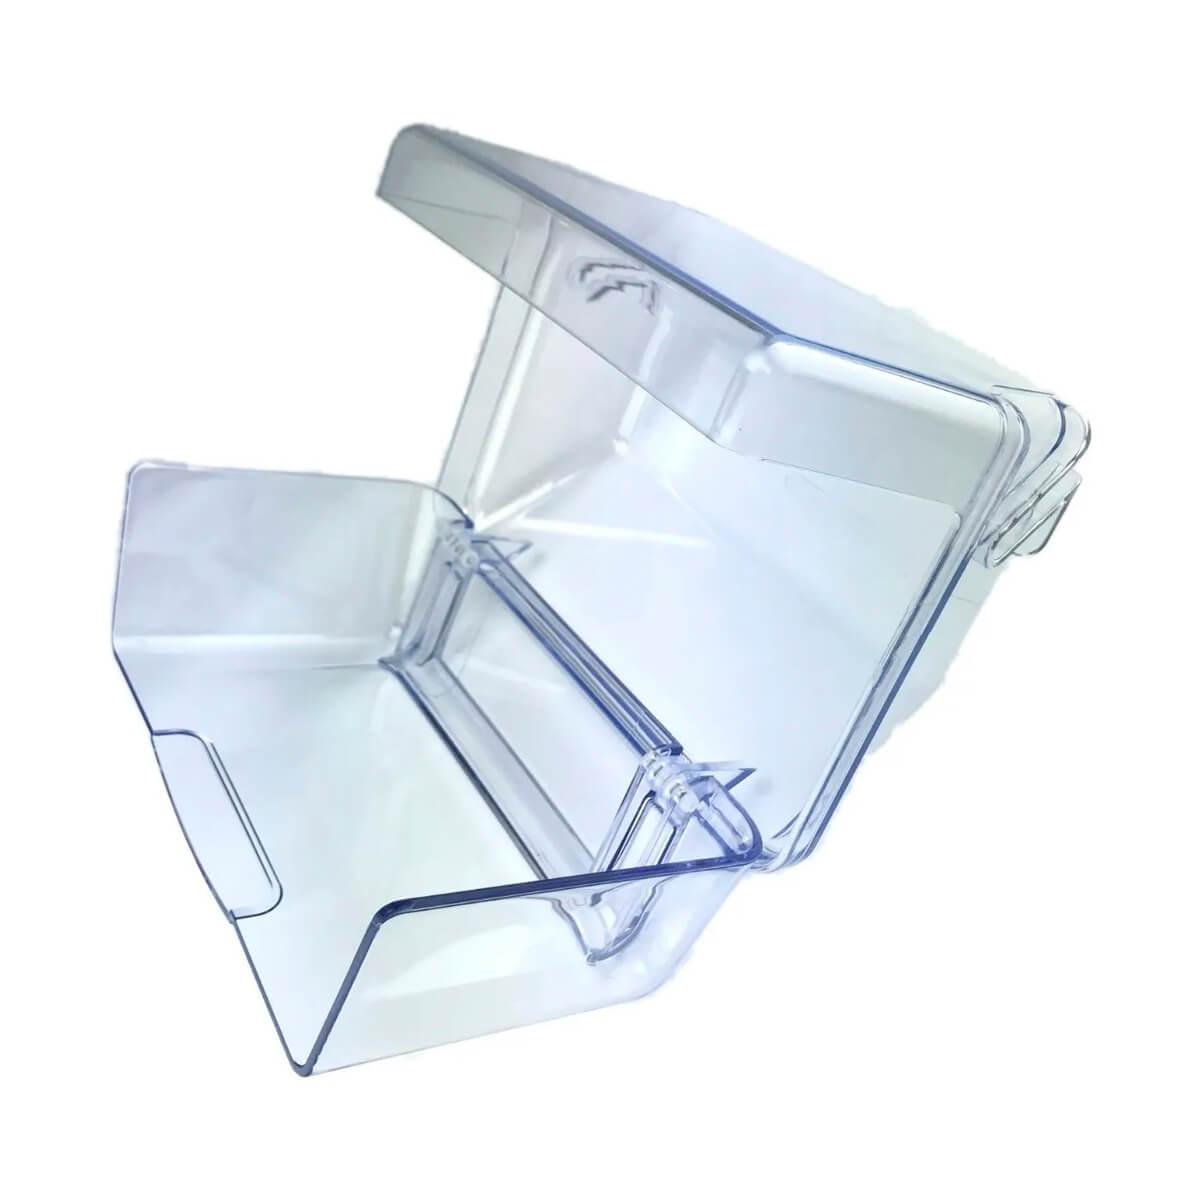 Compartimento My Space Para Refrigerador Electrolux DF50 DF50X DFN50 DFW50 - 70294684